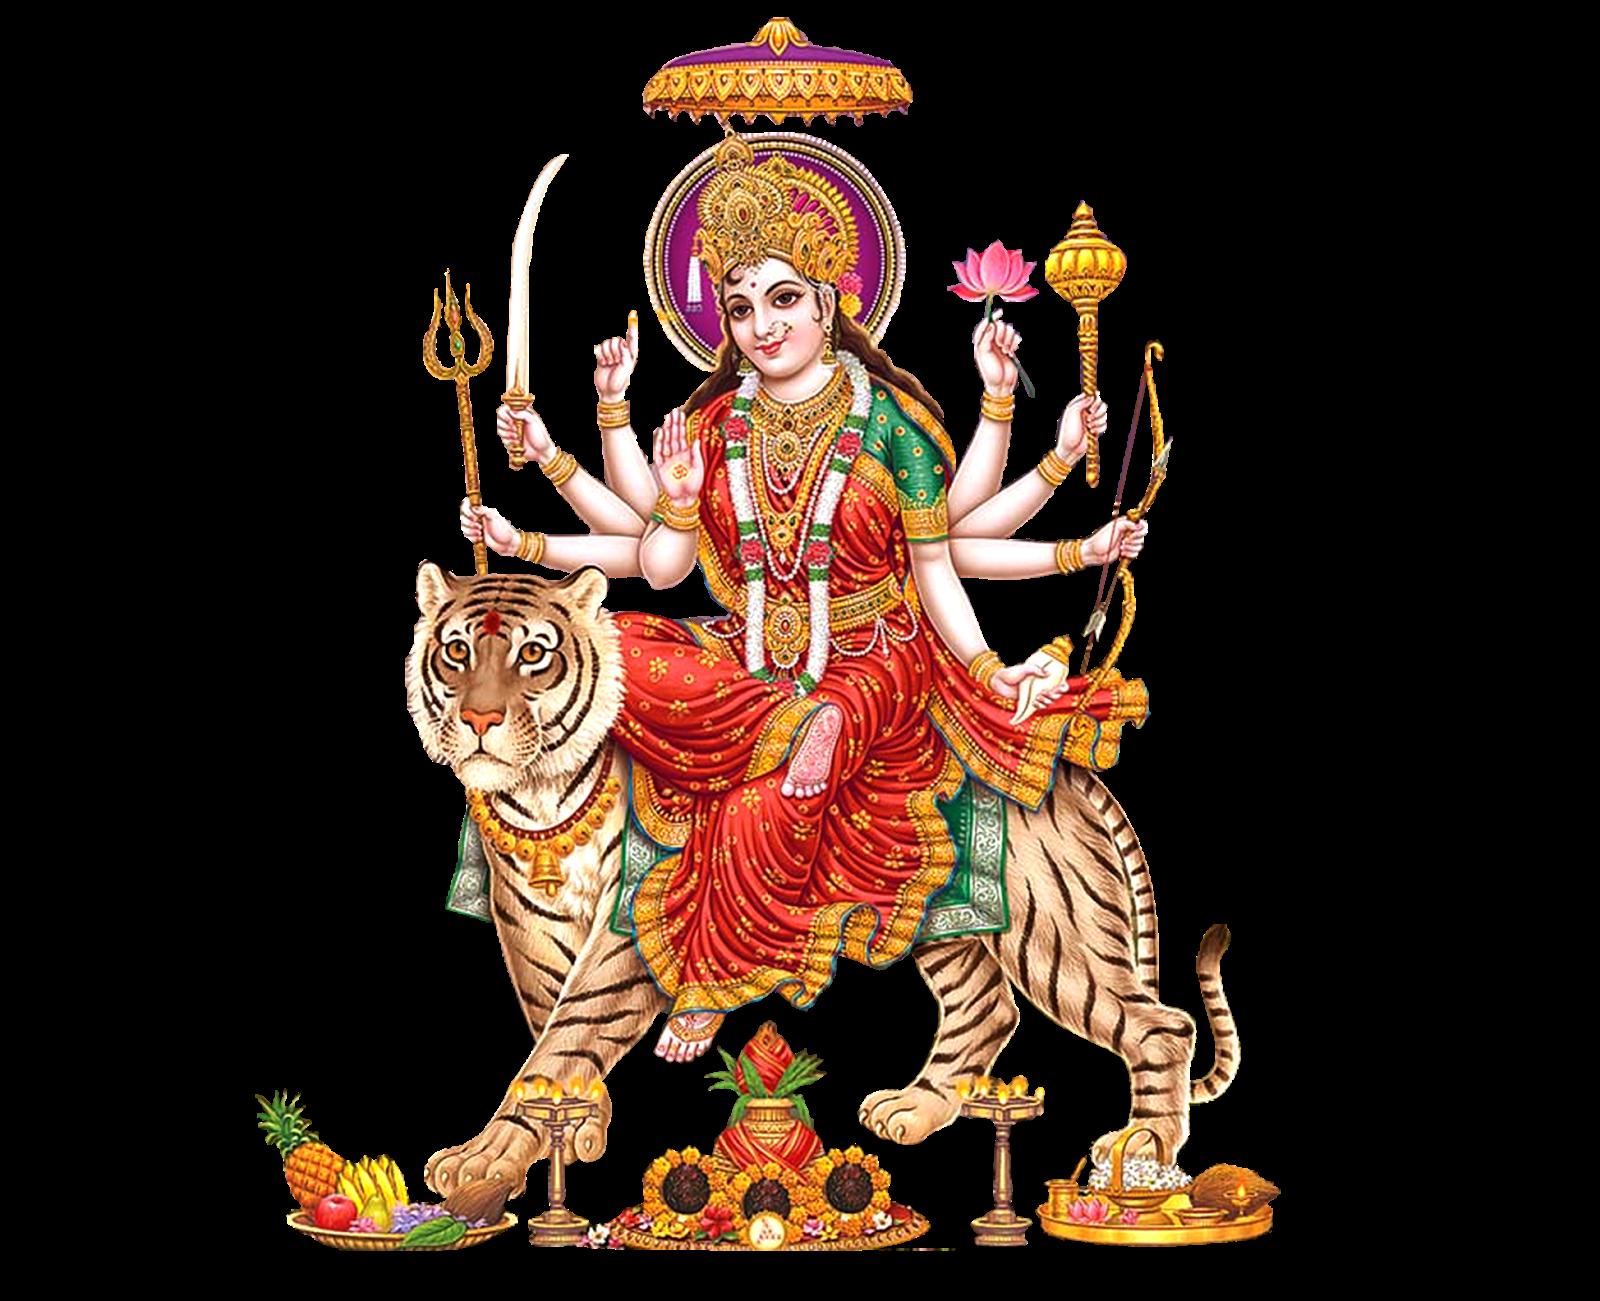 Png Images Of Indian Gods Telugu Vijayadashami Wishes Quotes HD Wallpapers  2016 Vijayadashami Wishes Quotes In - Hindu God PNG HD